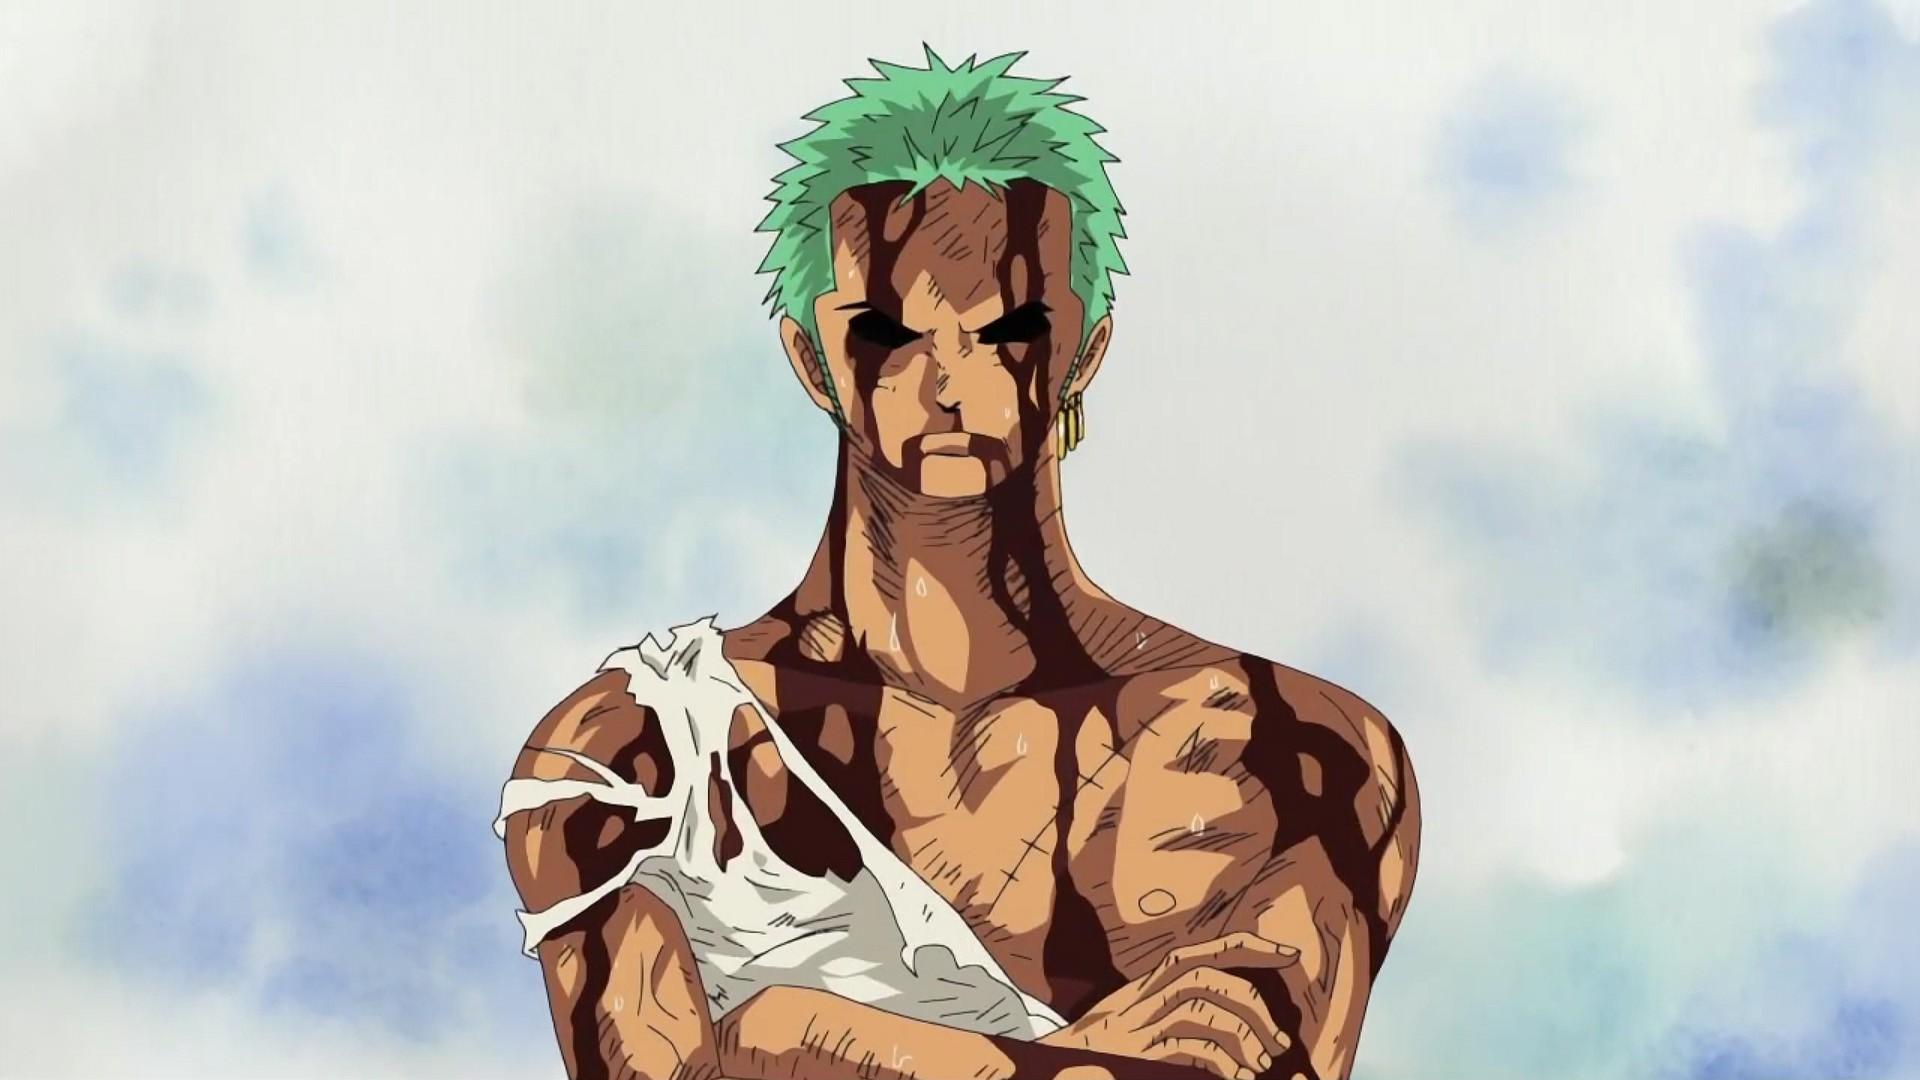 Zoro One Piece Images HD Wallpaper of Anime   hdwallpaper2013com 1920x1080